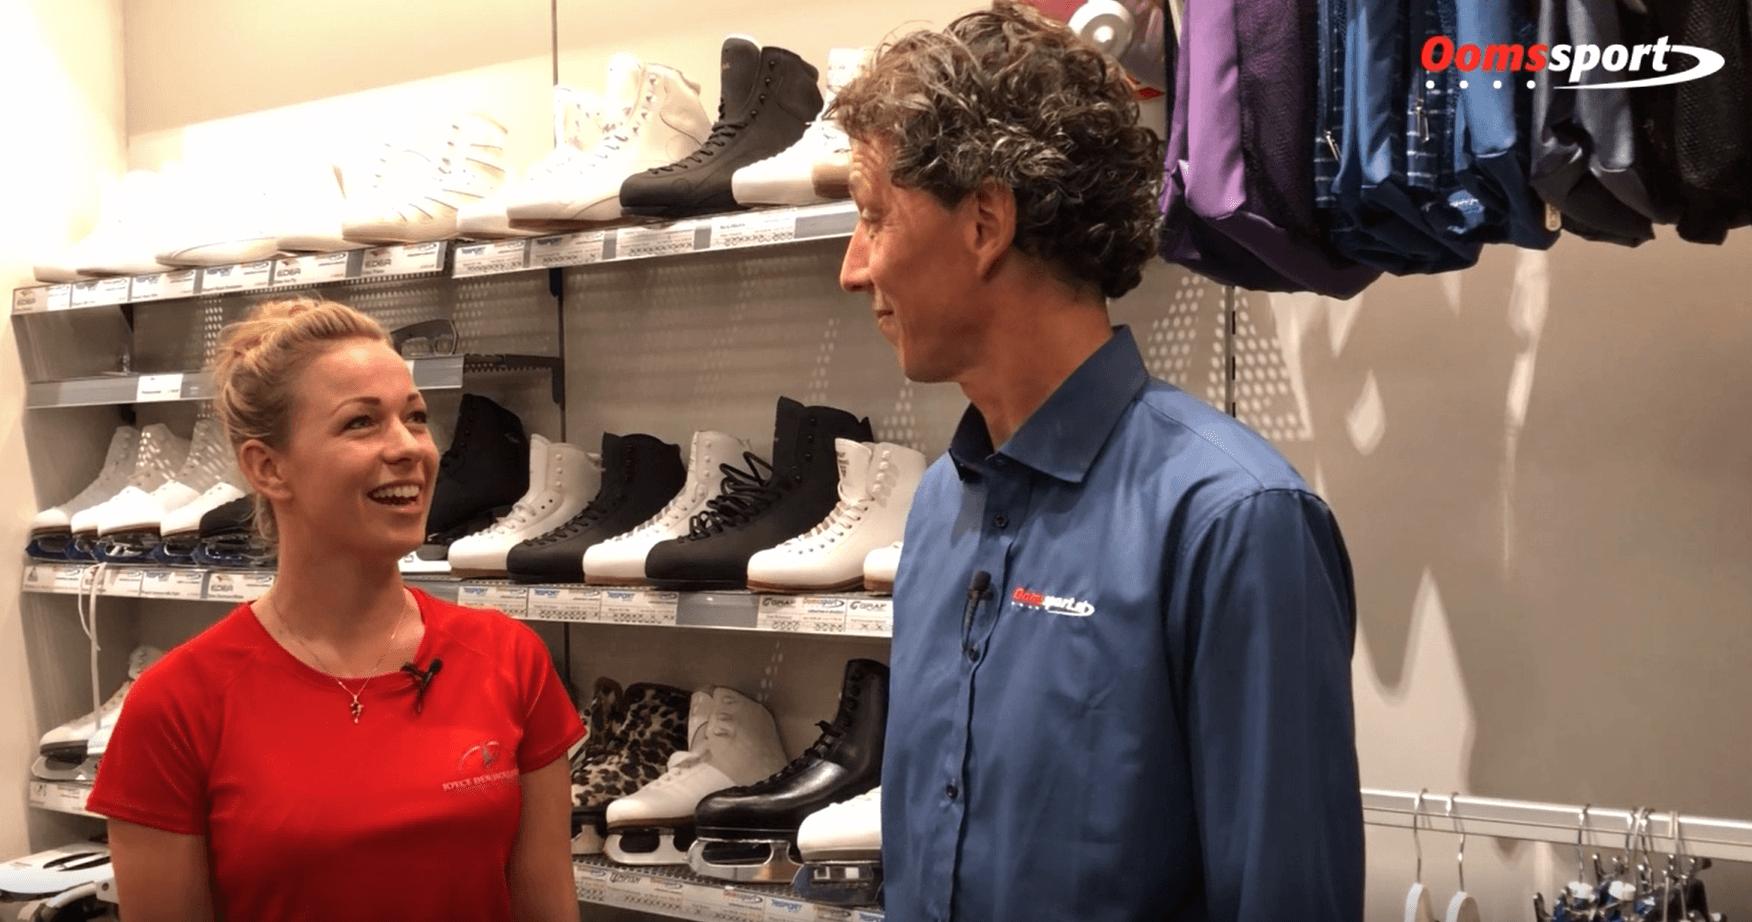 Video - Interview met 'Holiday on Ice' ster Joyce den Hollander